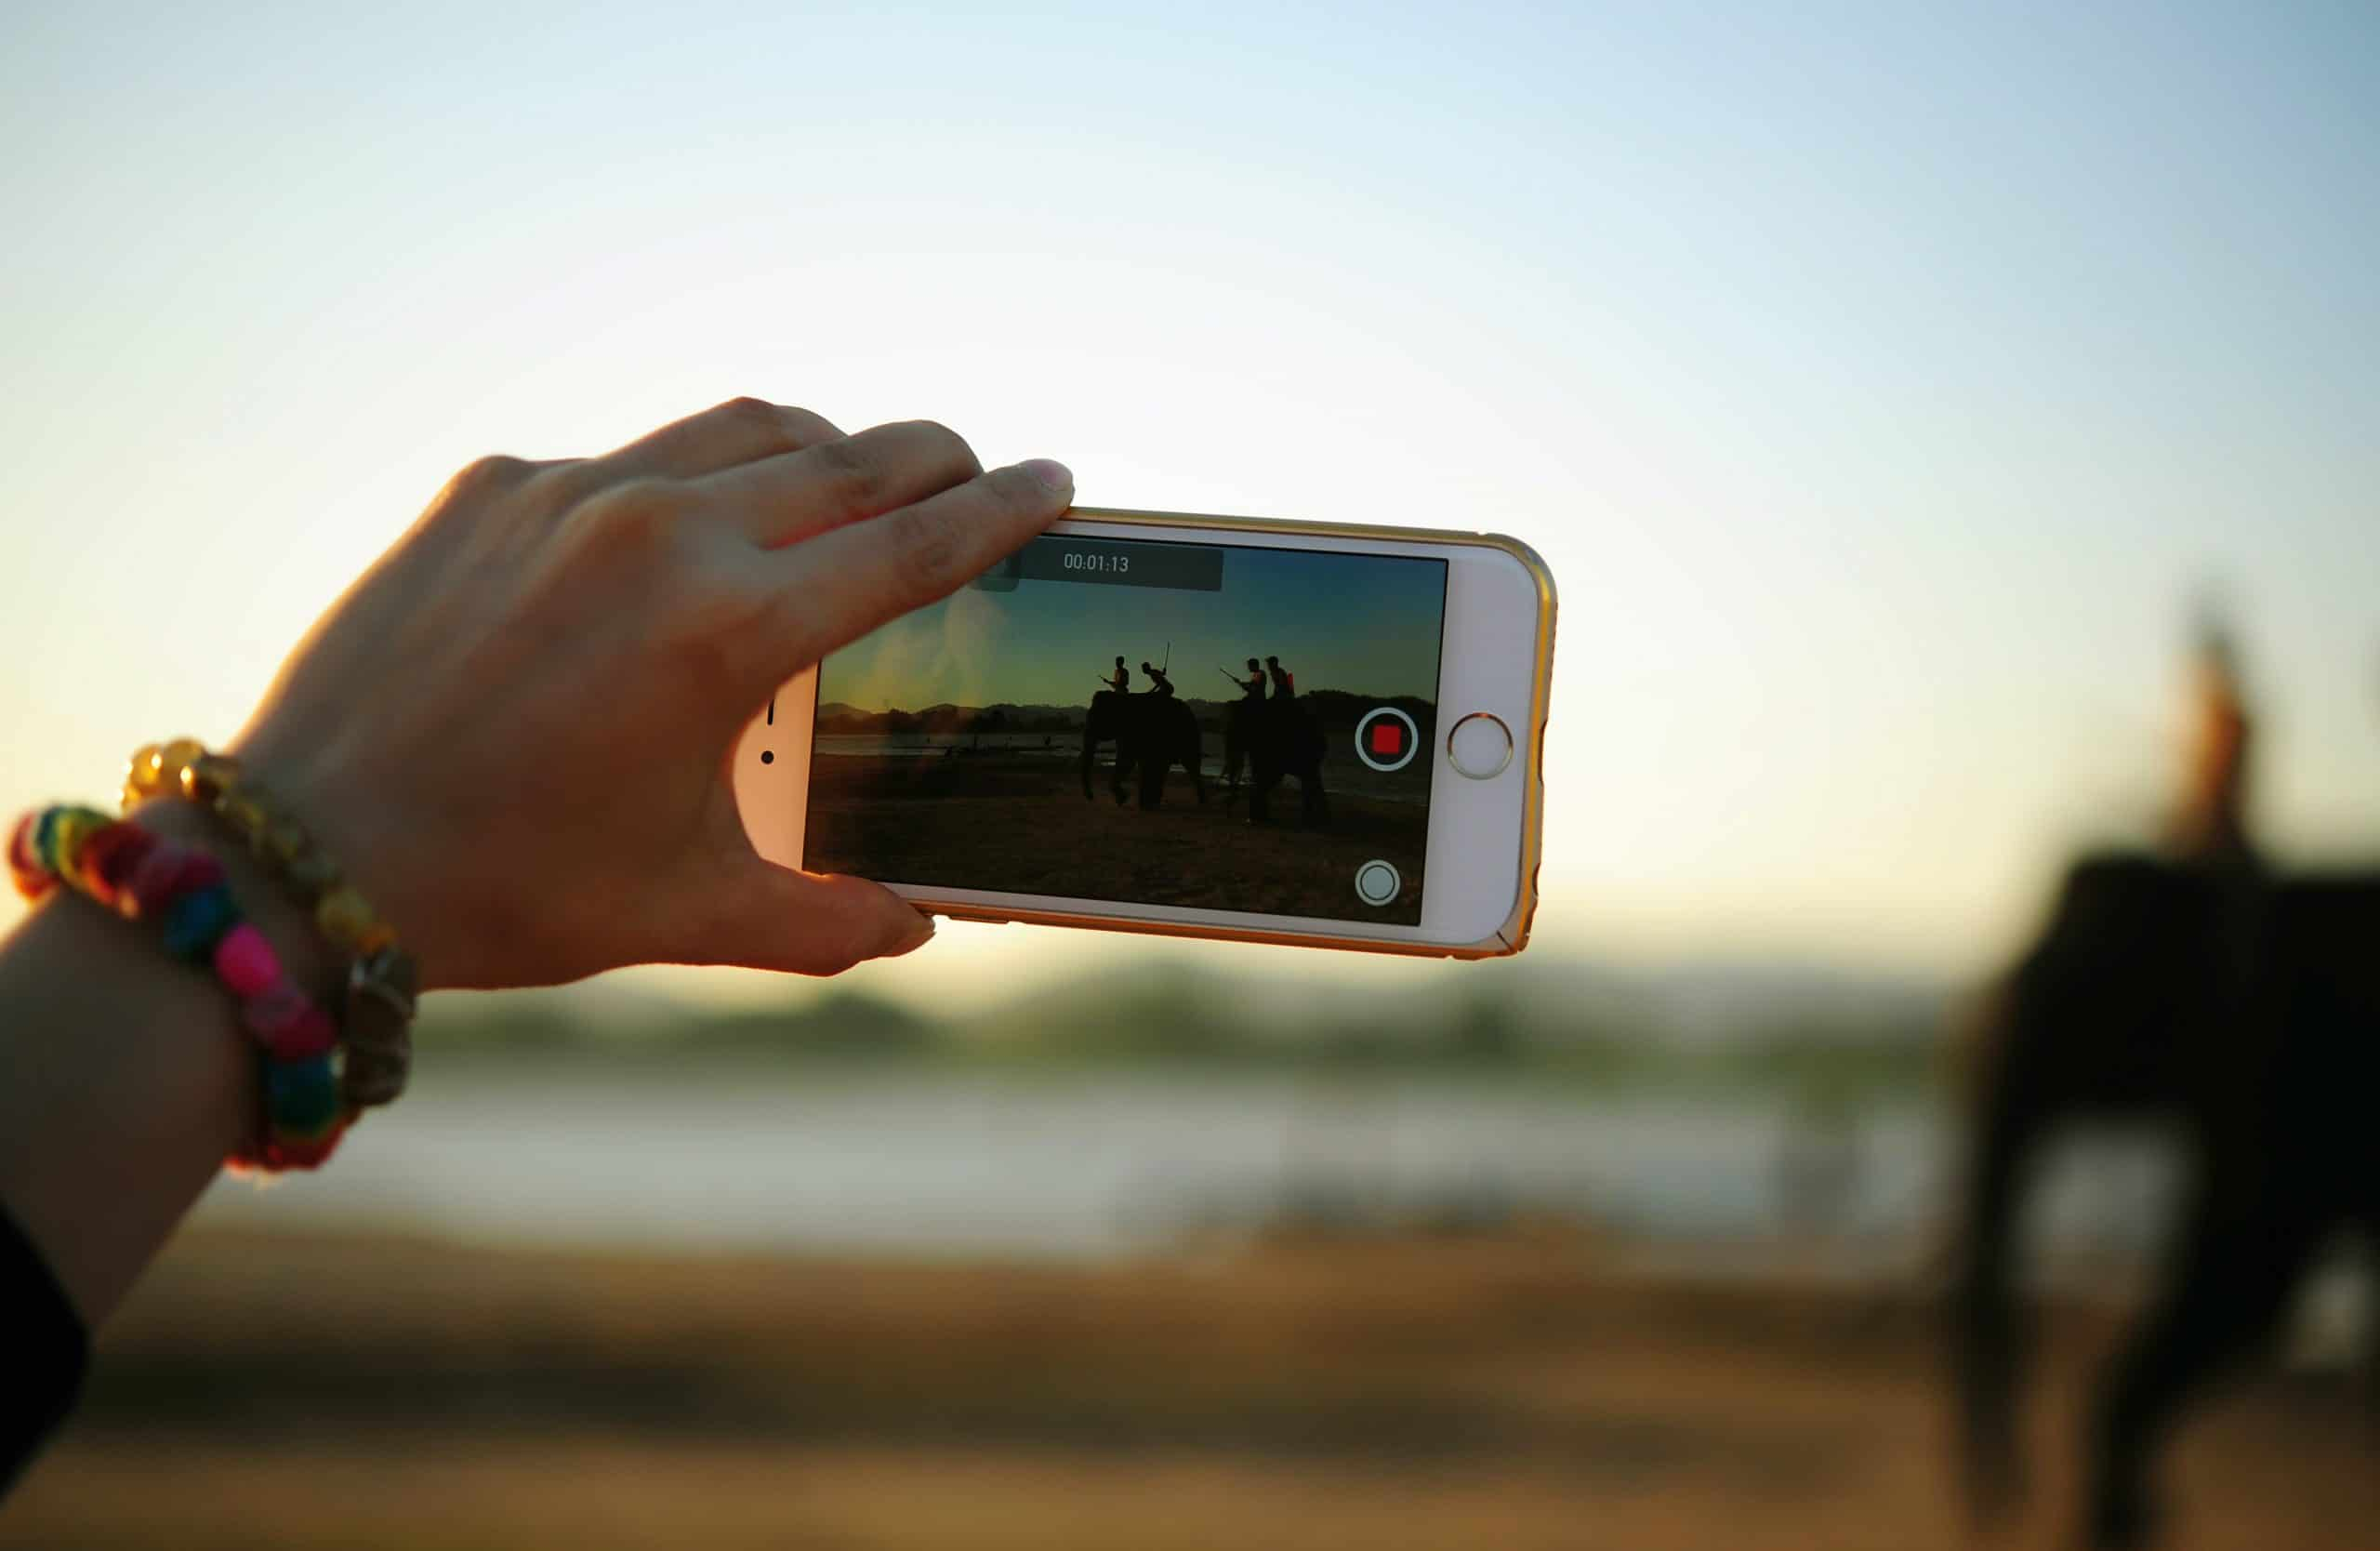 iphone filmmaking equipment